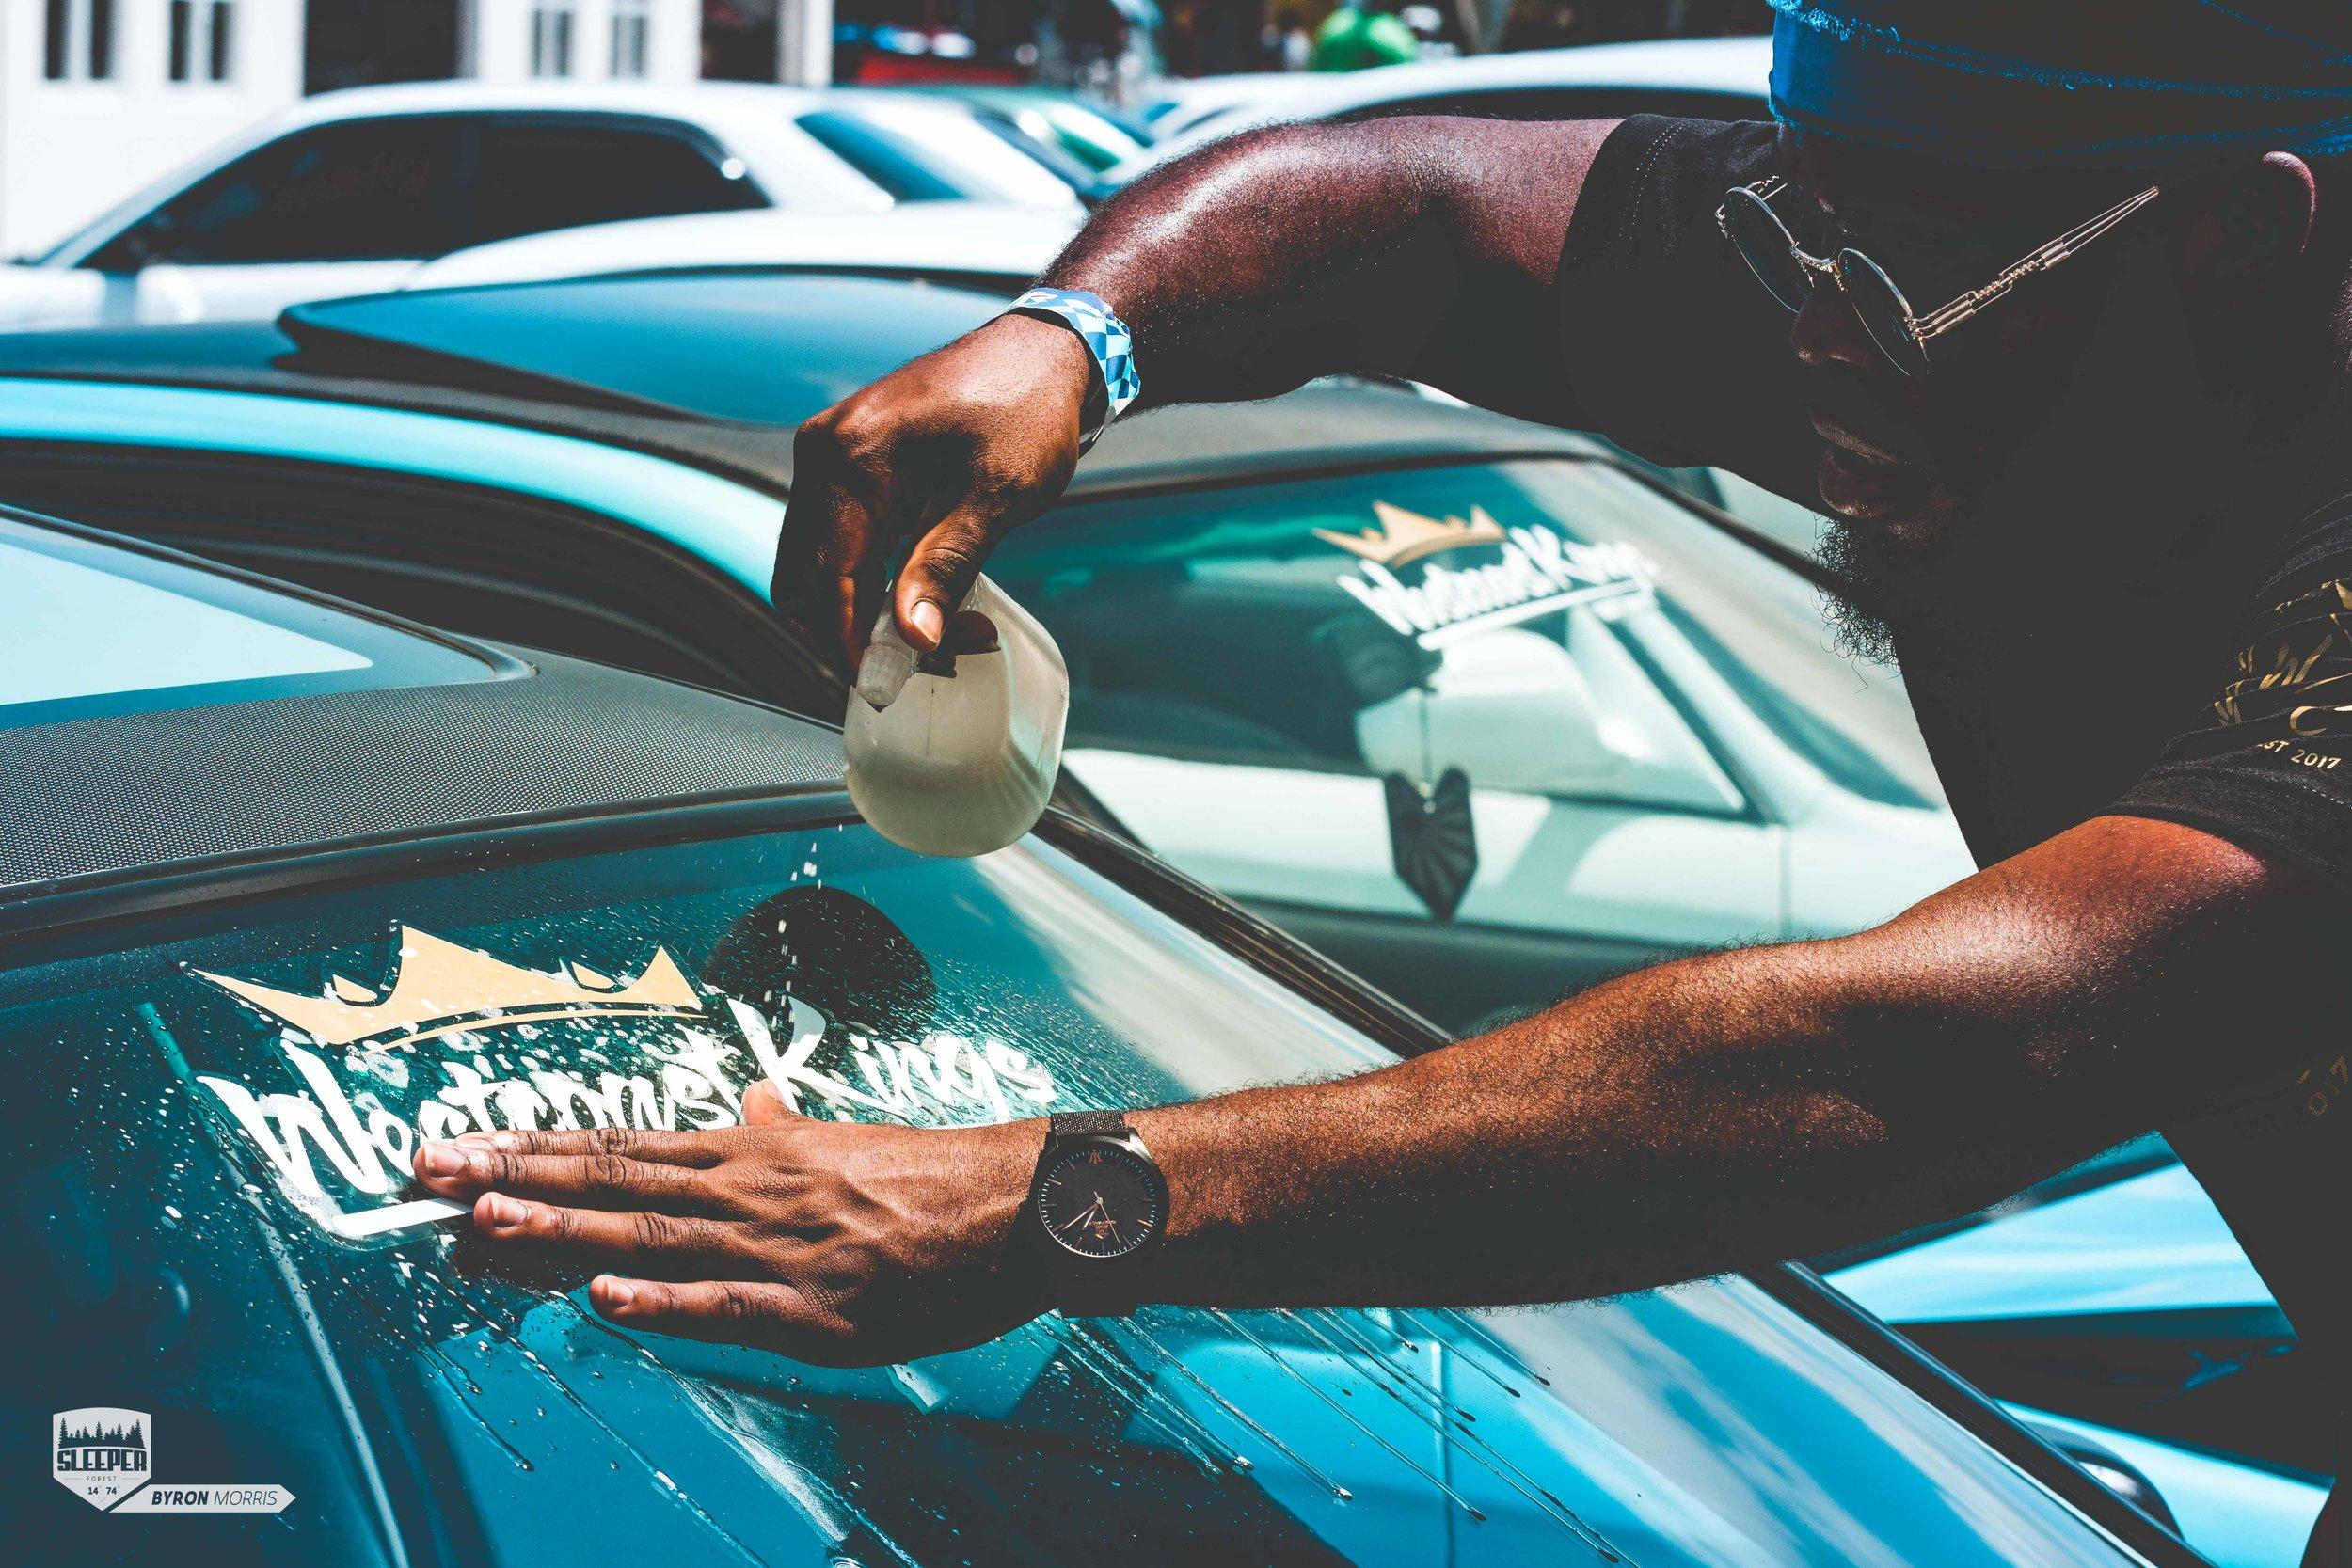 Rep_ya_ride_2019_barbados_car_culture-3.jpg